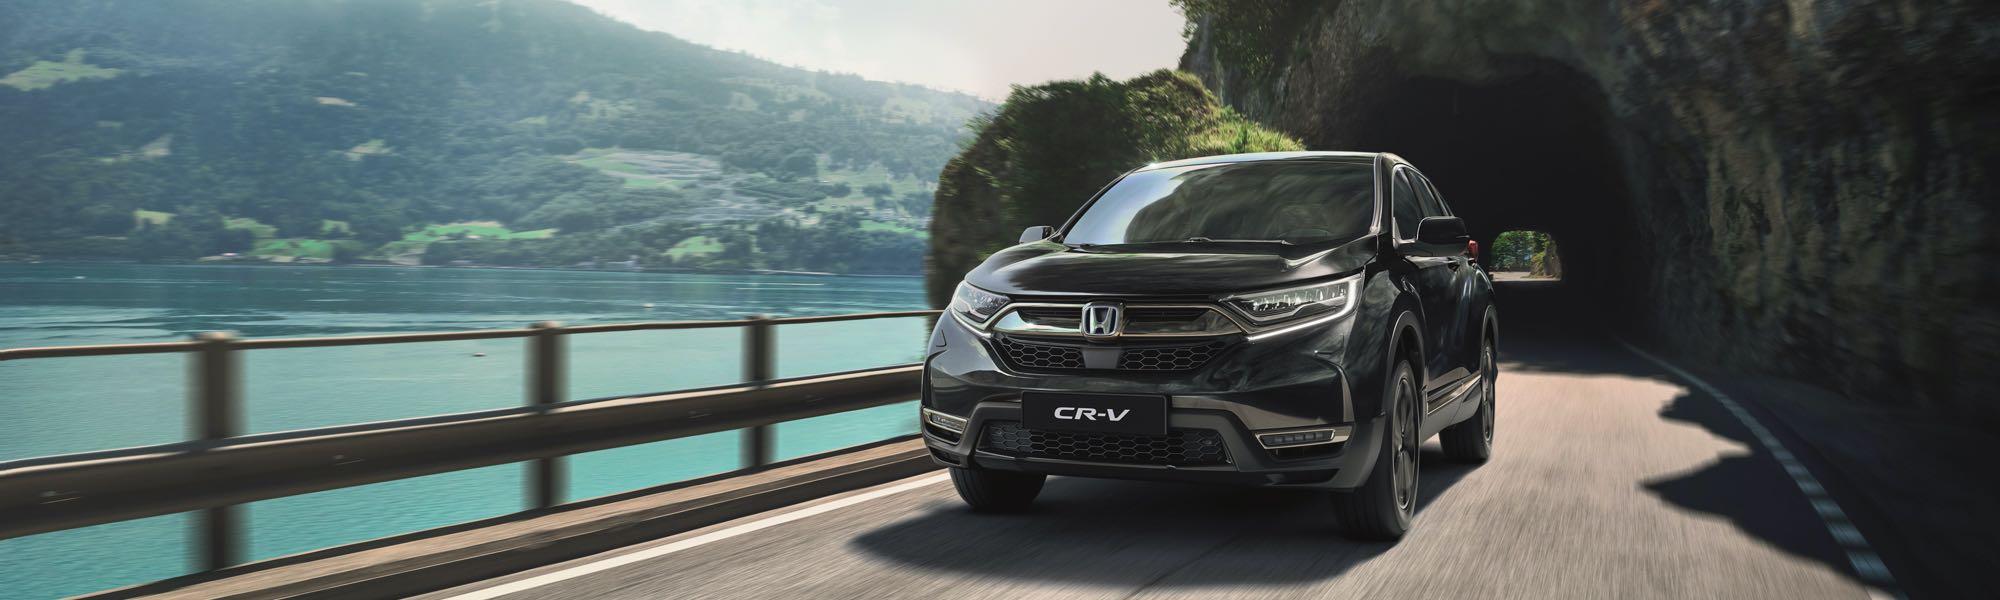 Der neue CR-V Hybrid